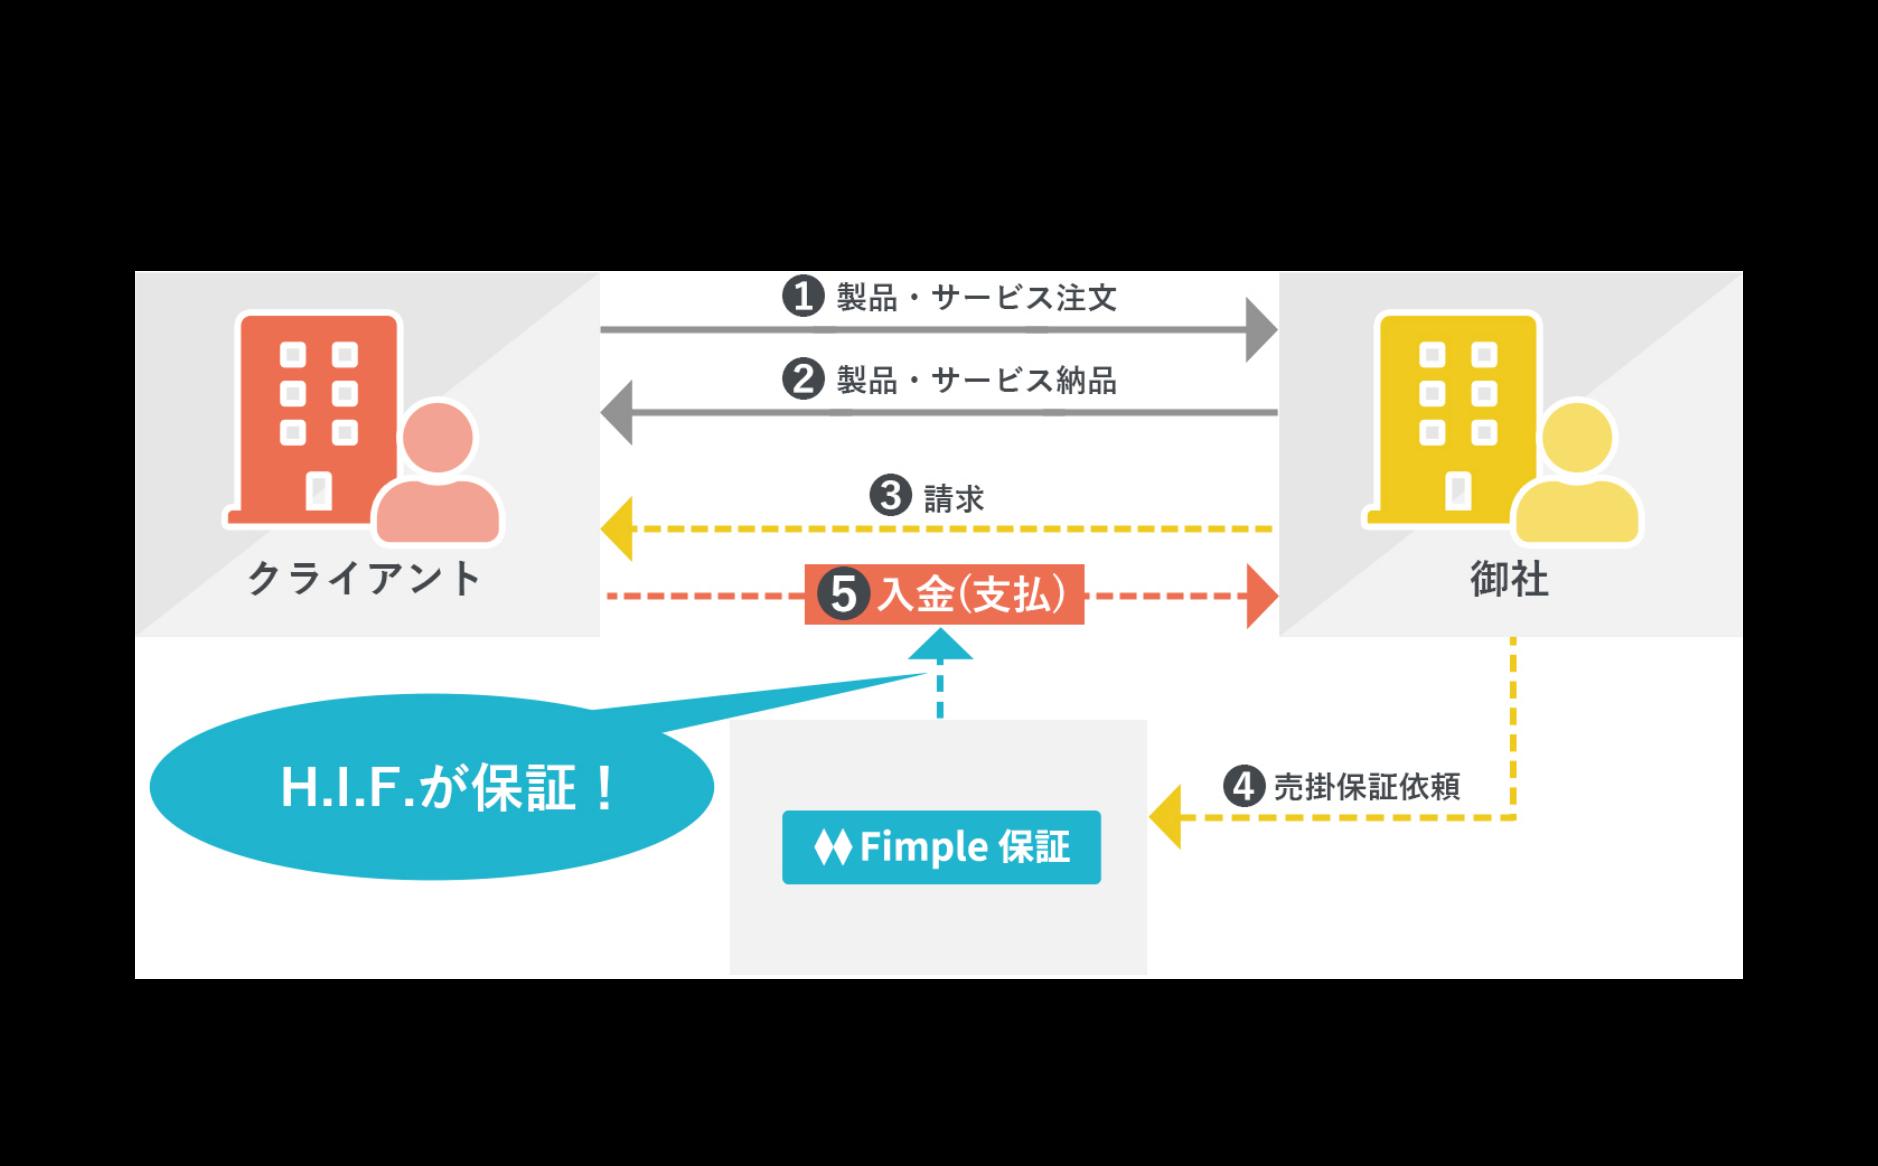 Fimple保証利用時の売上保証の流れのイメージ図